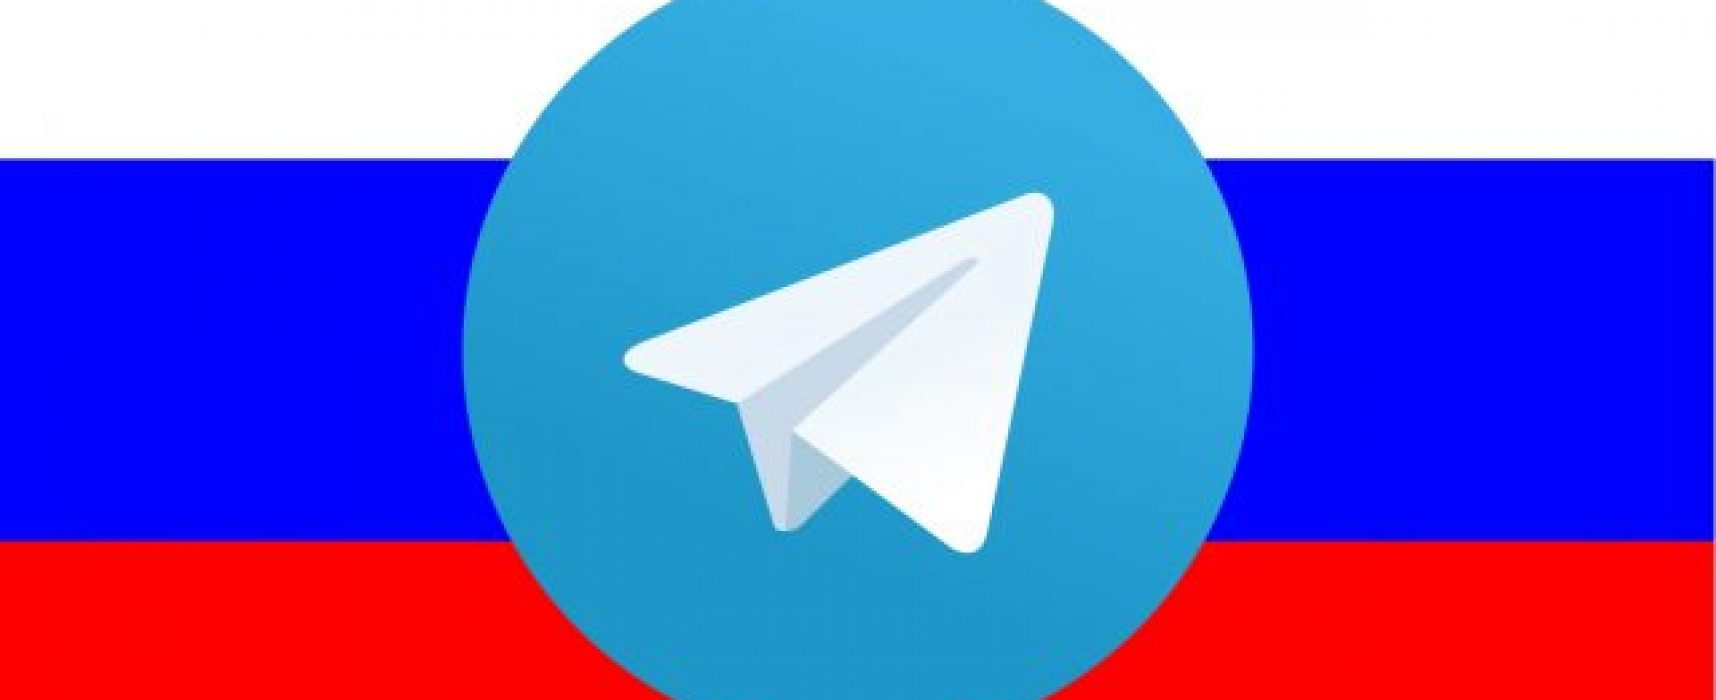 "Netizen Report: Rusia bloquea millones de direcciones IP, todo por el ""IPocalipsis"" contra Telegram"